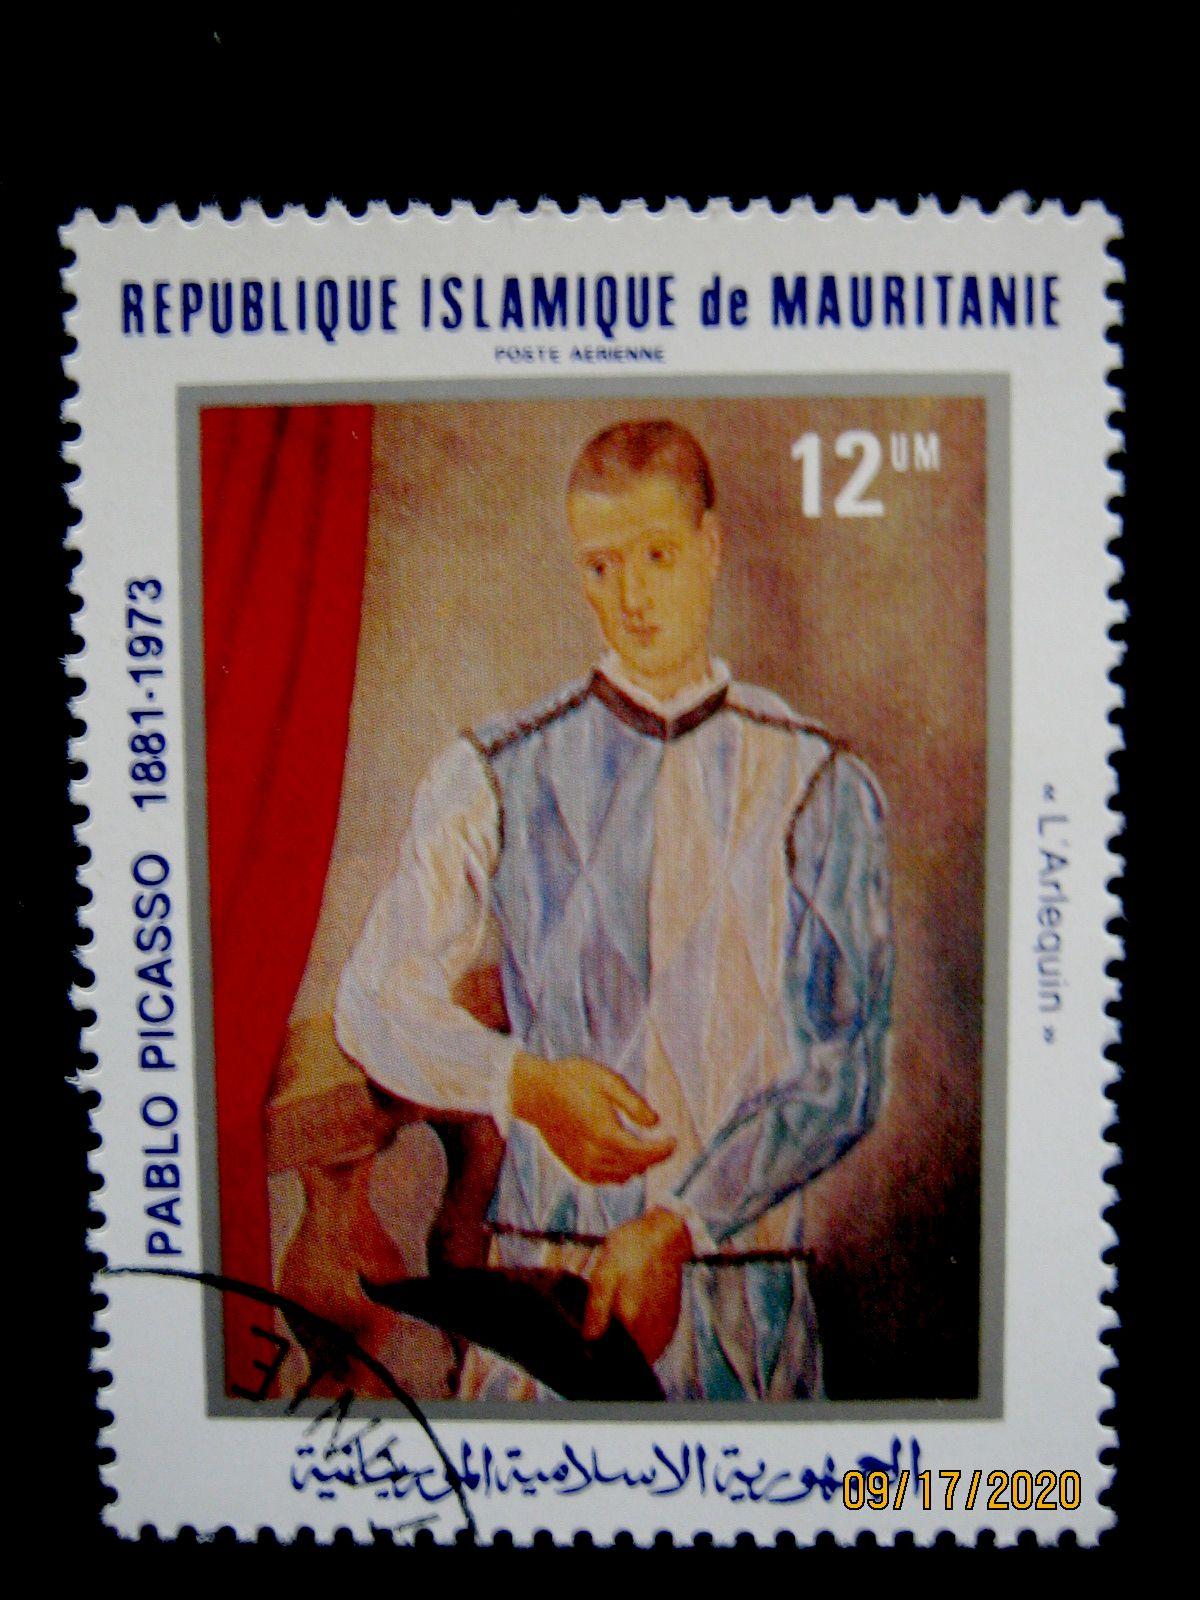 Марка 1981-06-29 Мавритания (Исламская Республика Мавритания), номиналом: 12 кхумов (um)—  «Арлекин» Пабло Пикассо, Mi:MR 721, Sn:MR C207, Yt:MR PA204, Sg:MR 695.